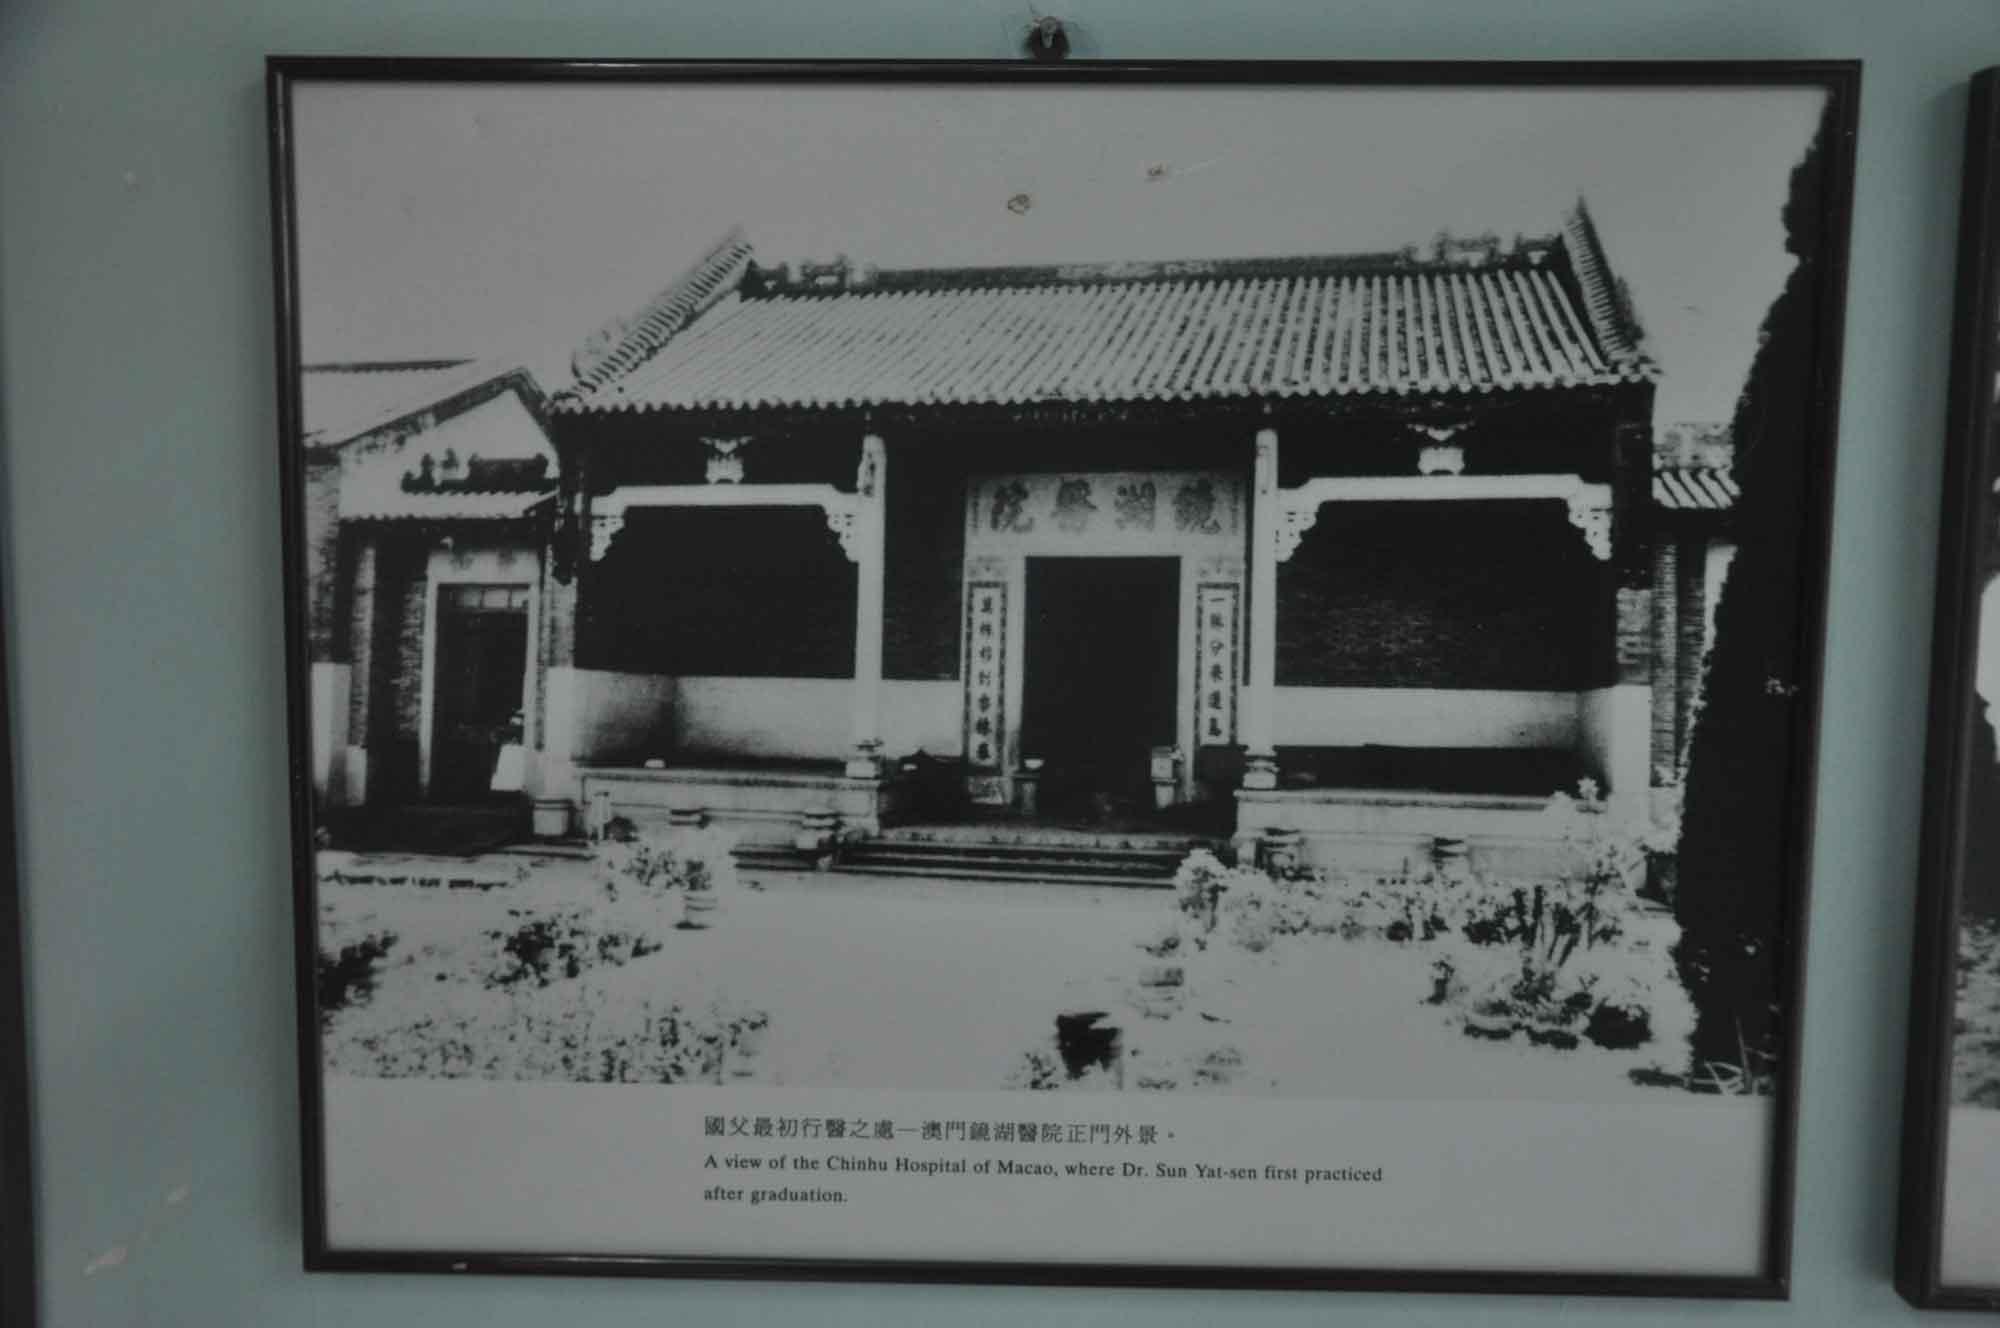 Sun Iat-Sen Memorial House Chinhu Hospital